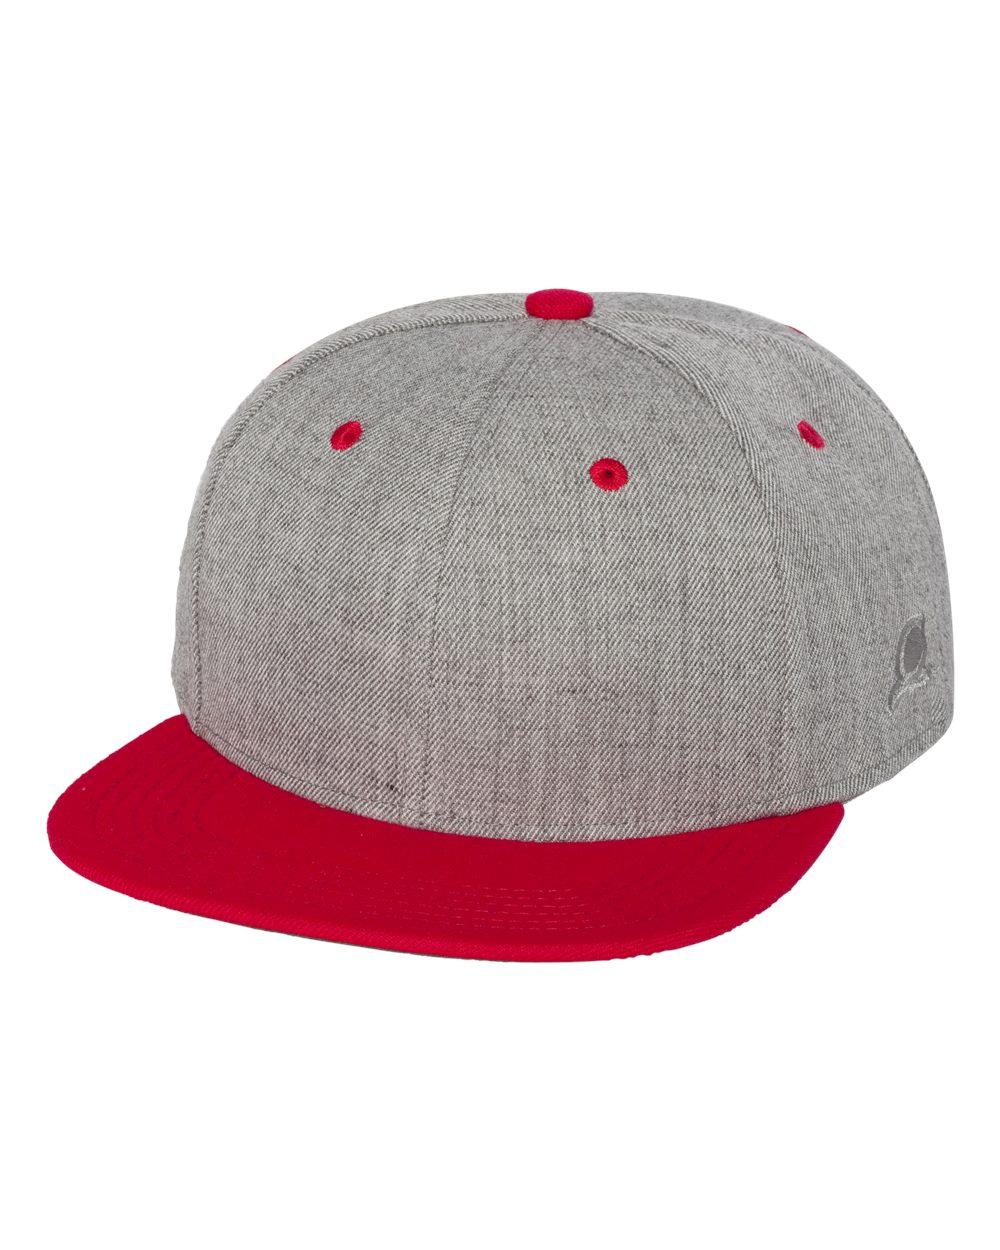 e9d205f9cbf Original Chuck 27218 - 70 30 Acrylic-Wool Blend Snapback Hat - A ...